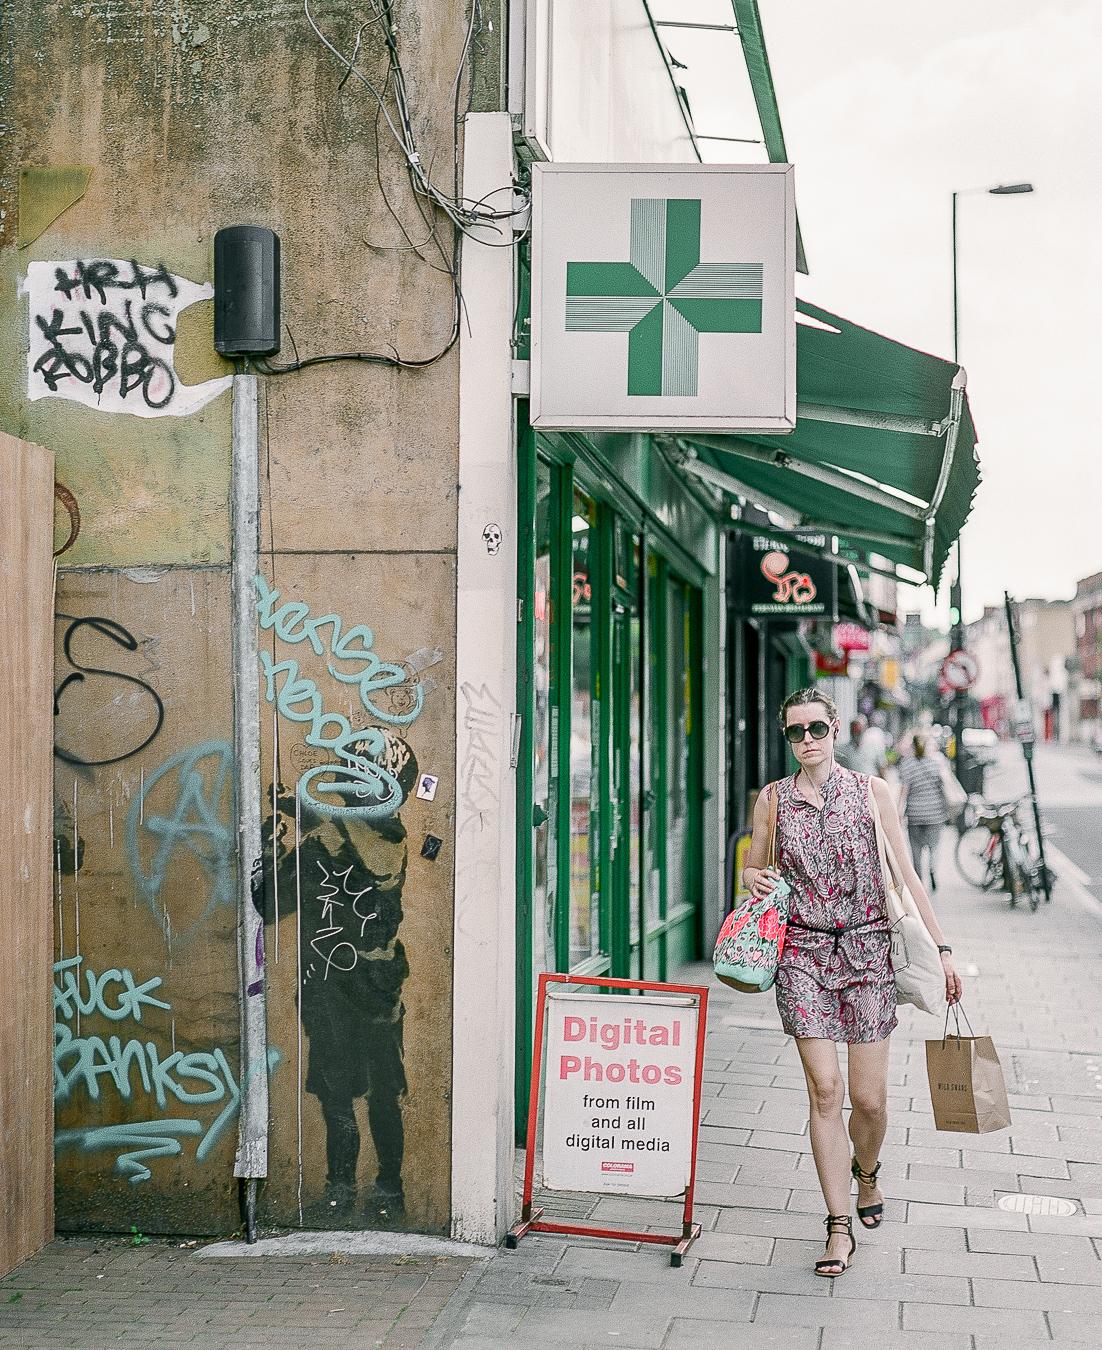 Banksy's 'Very Little Helps' - ARTVISIT .